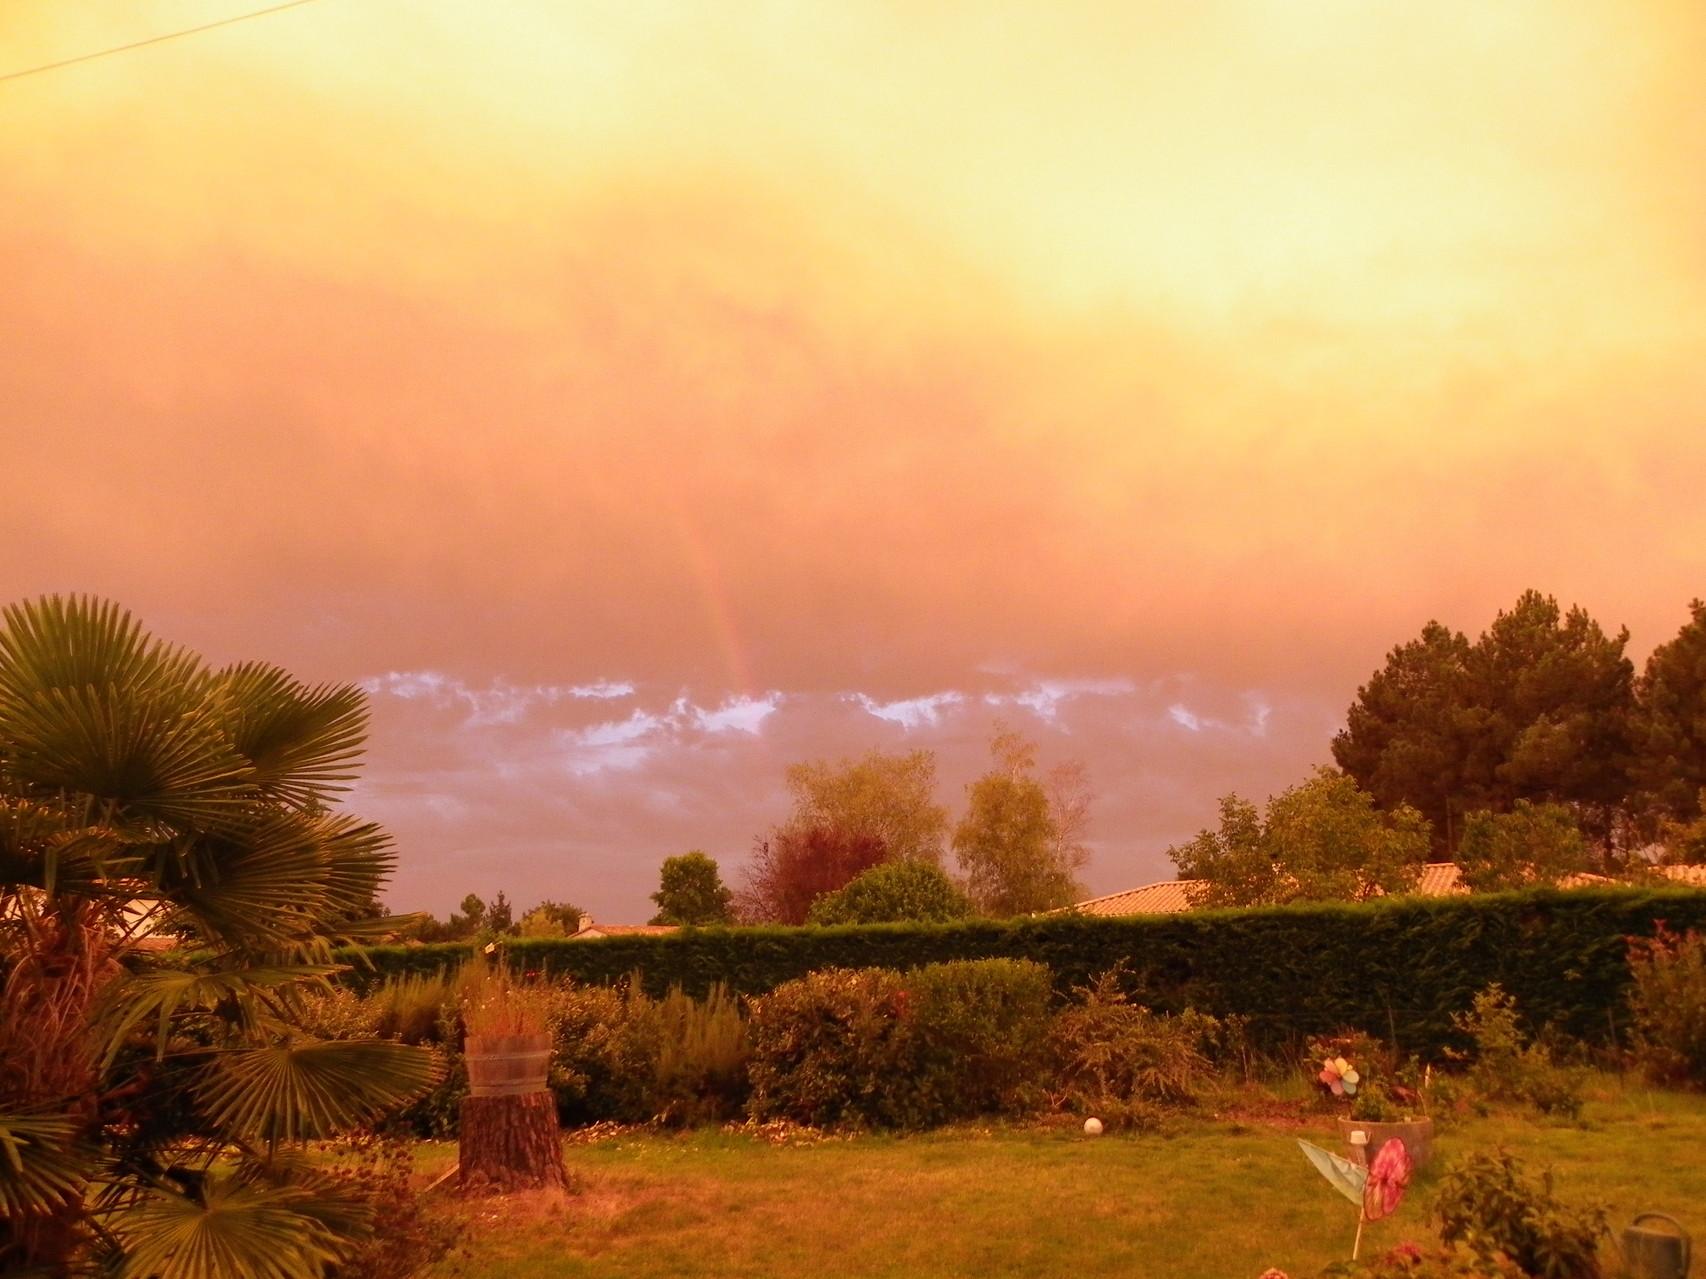 couleur inquiétante orage en vue